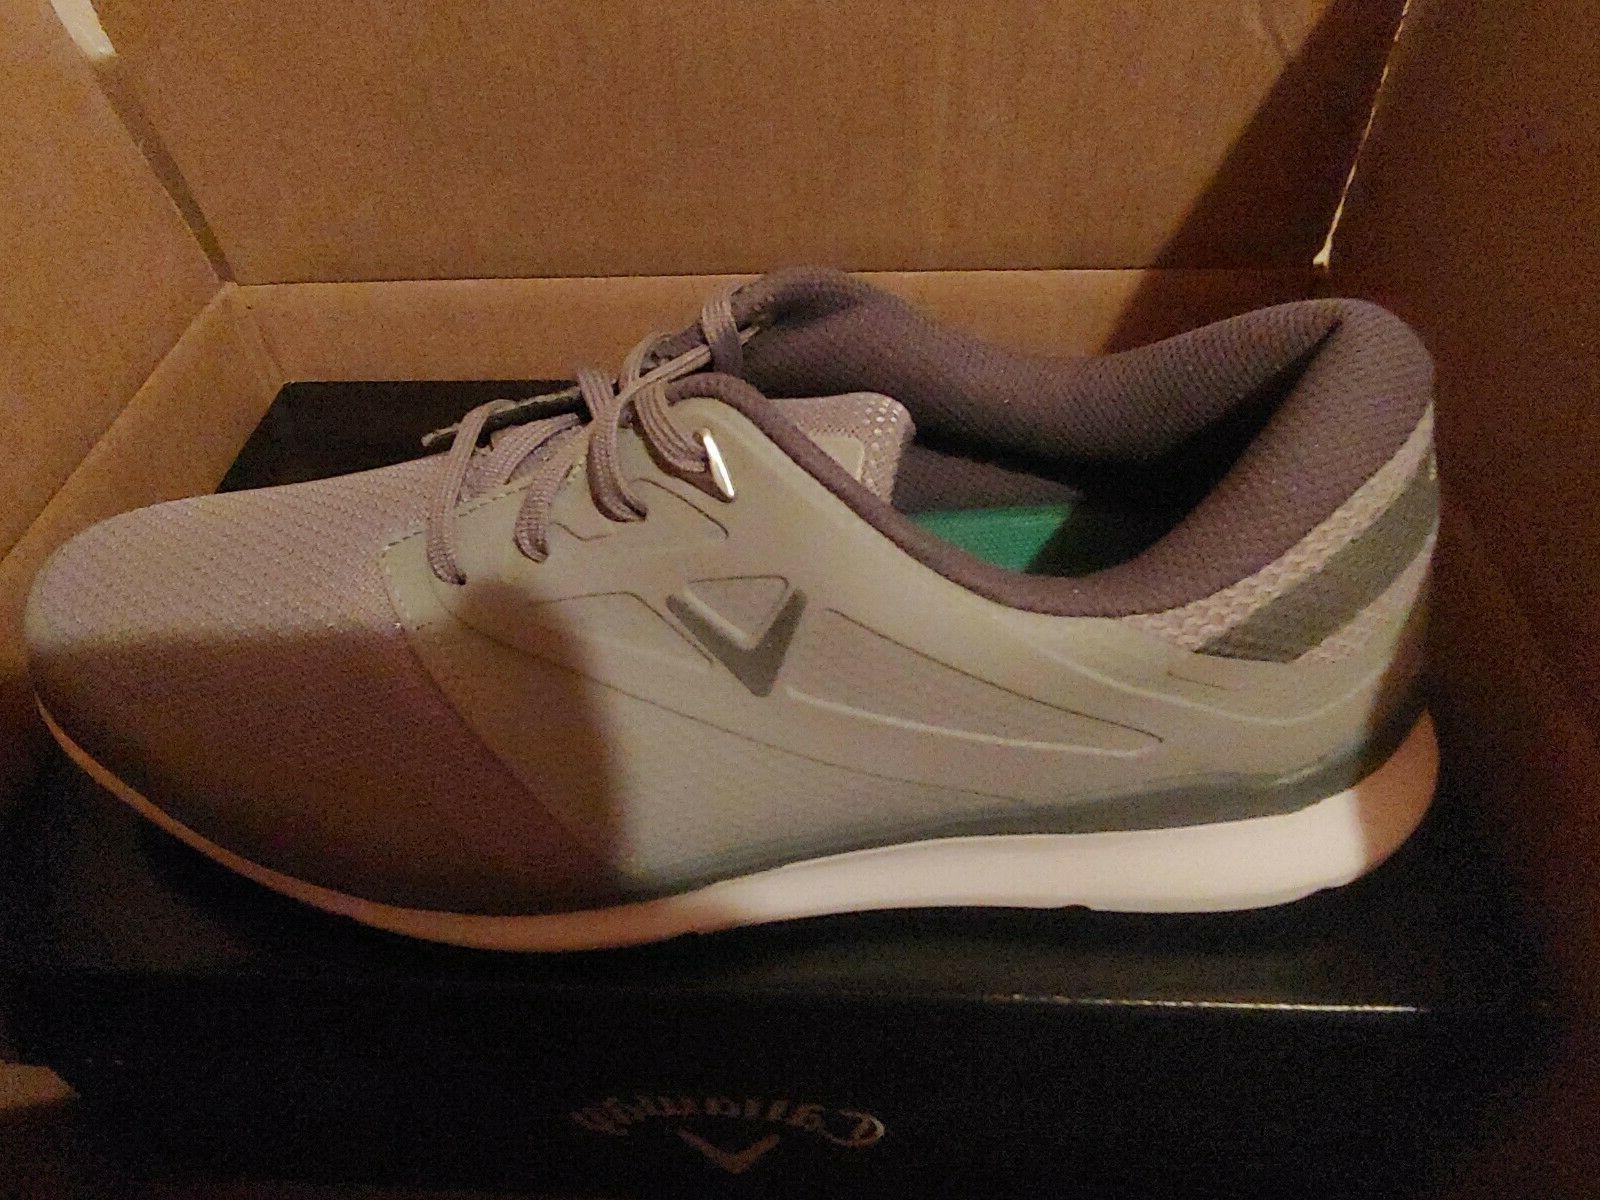 new golf oceanside shoes size 11 medium